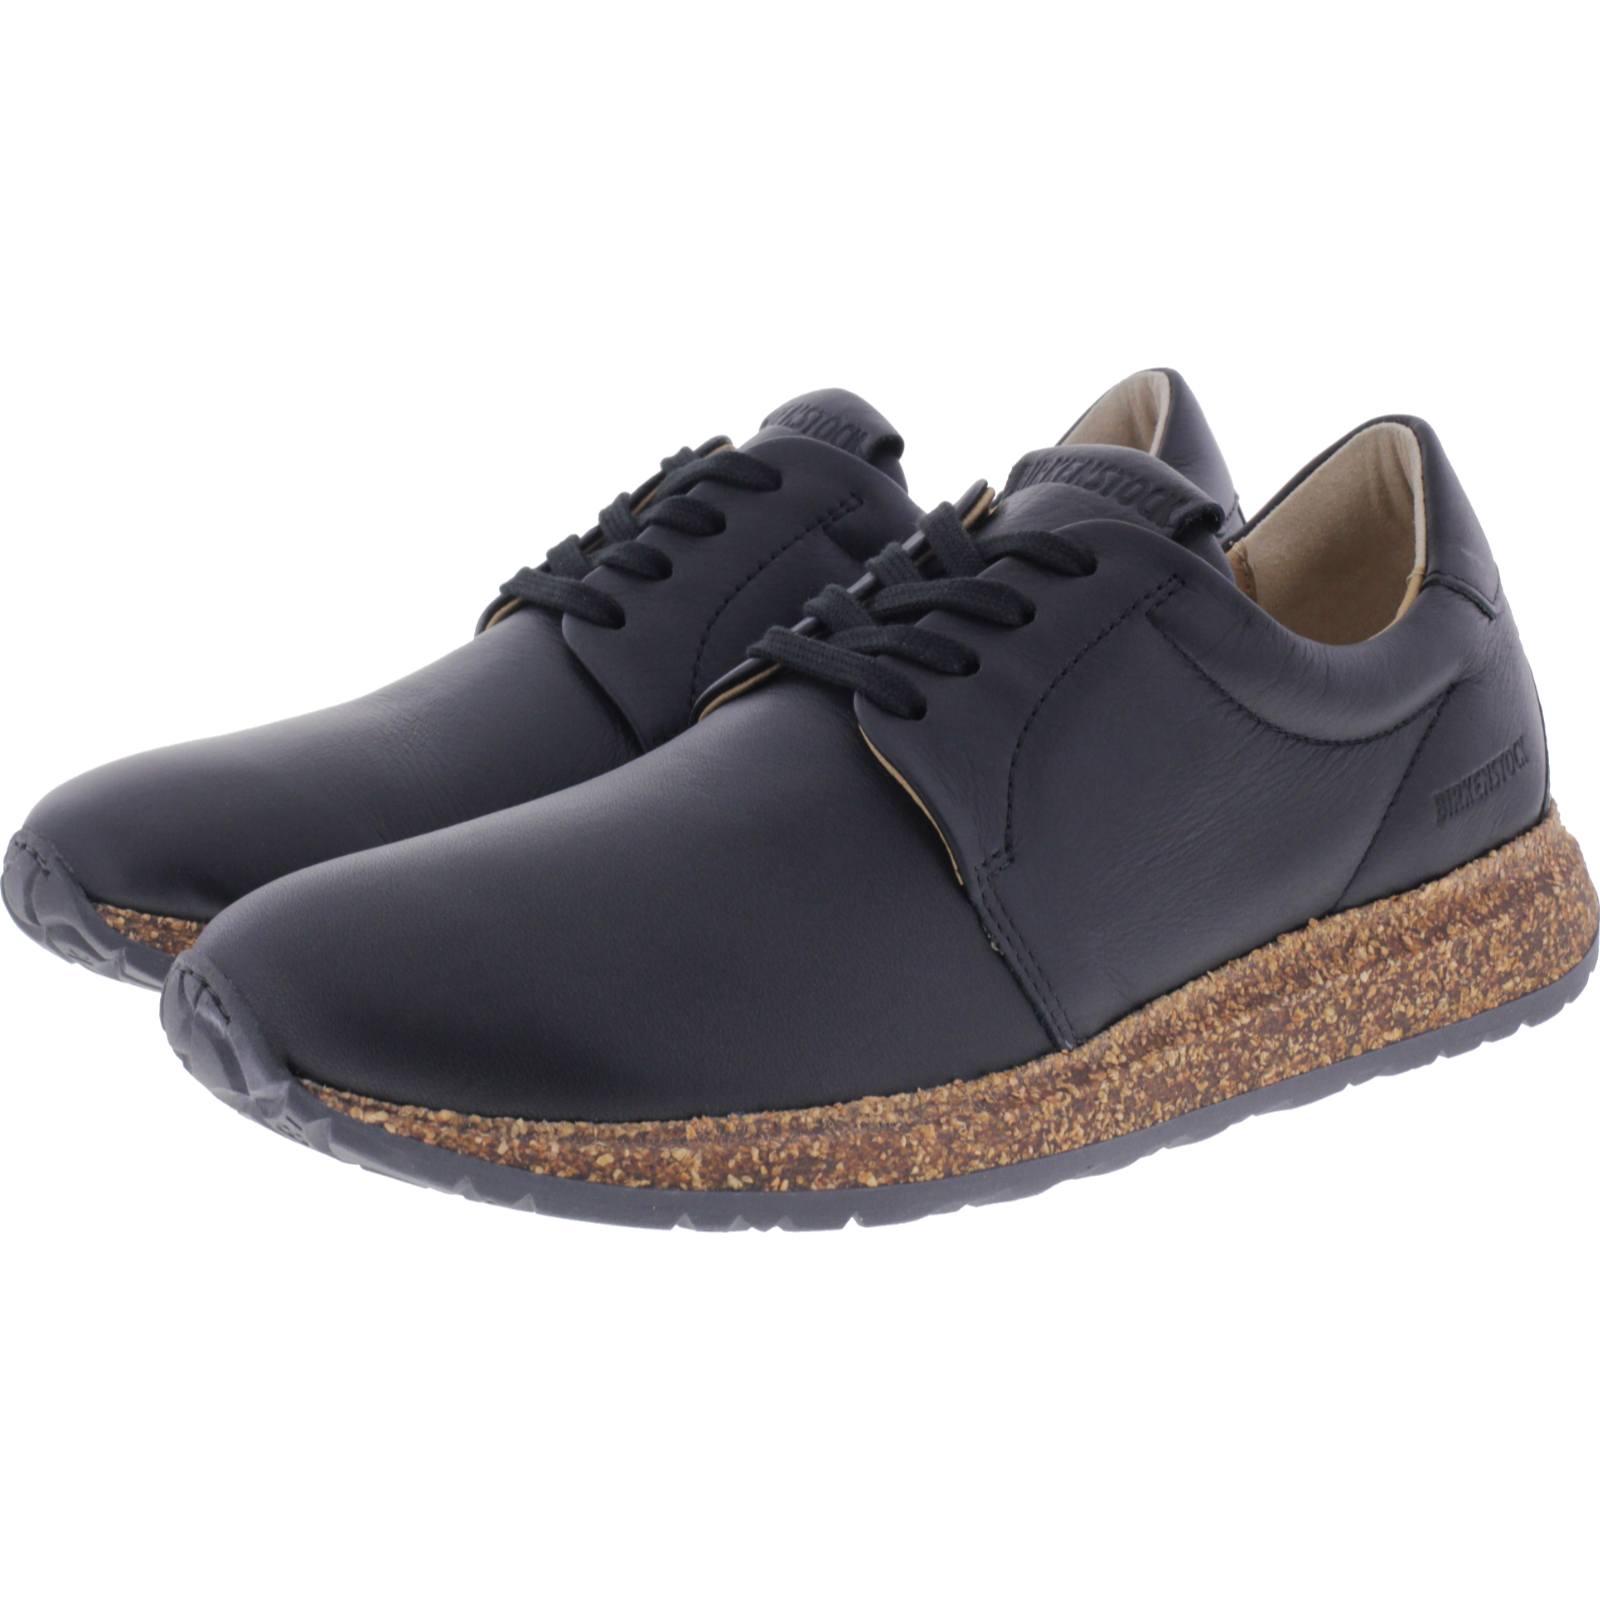 Schwarz Art1010973 Shoes Leder WeiteSchmal ModellWrigley Birkenstock N8vnOmw0